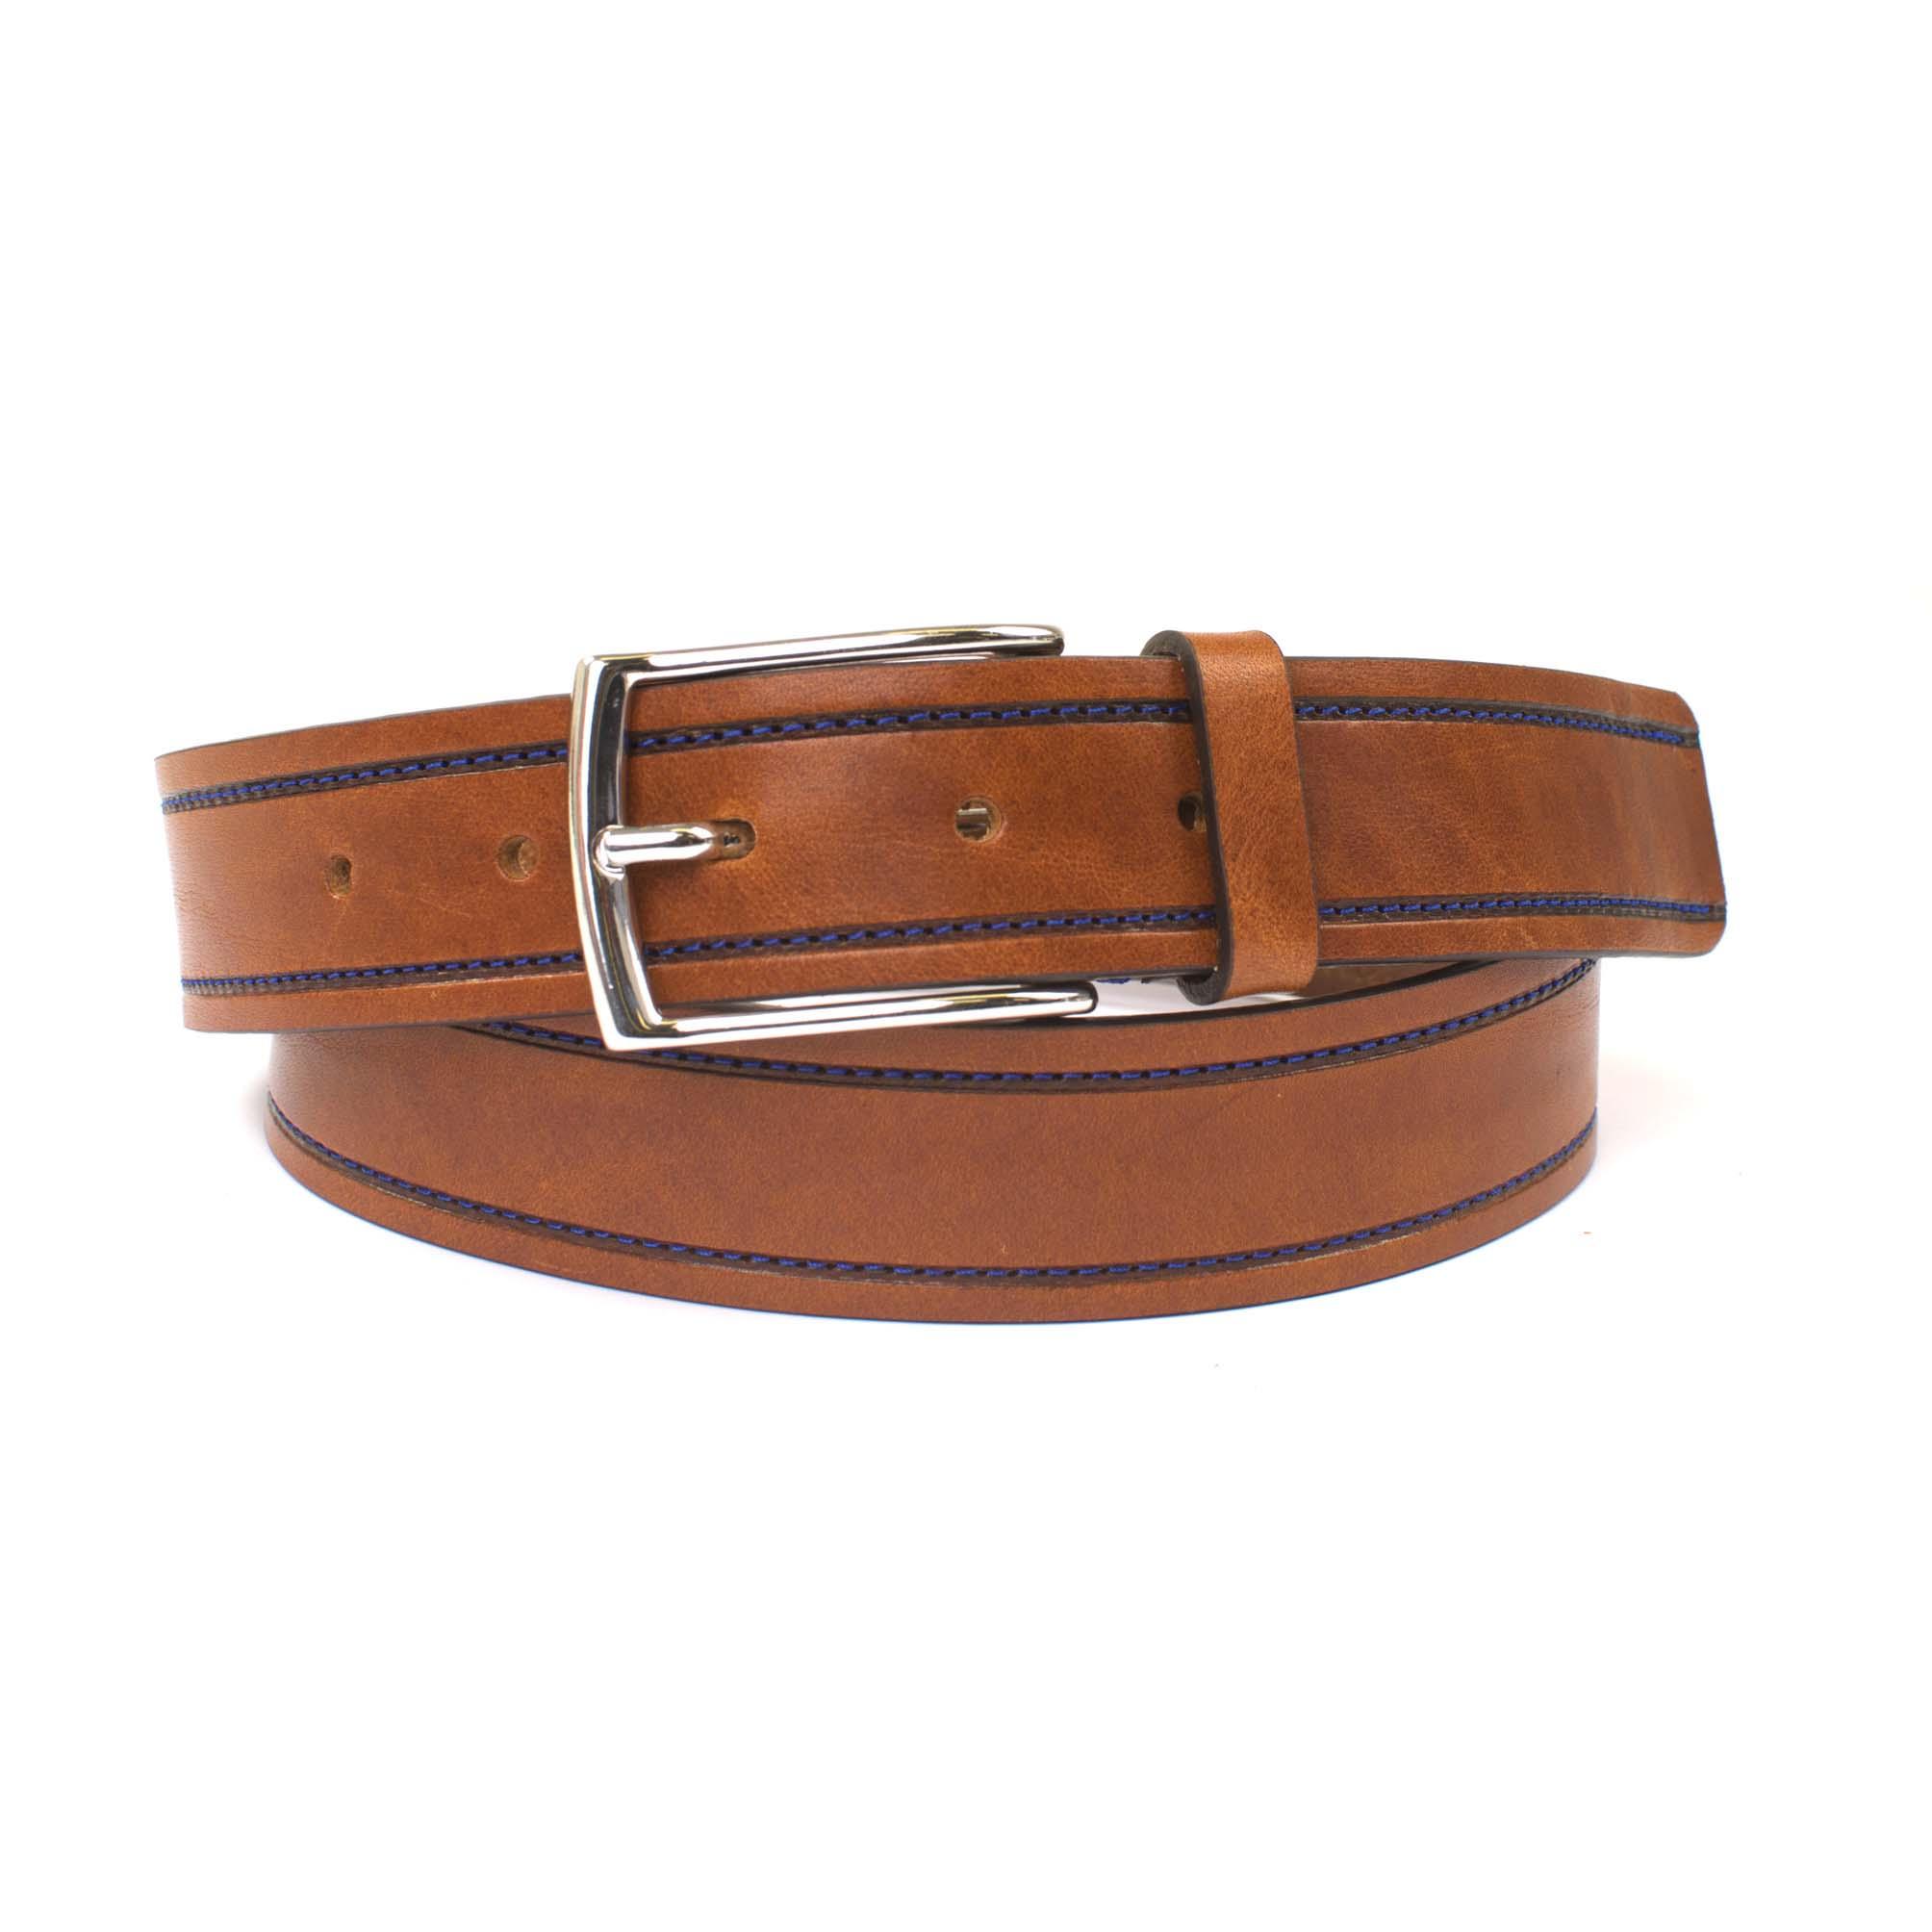 Tim | Belt leather contrast stitching brown